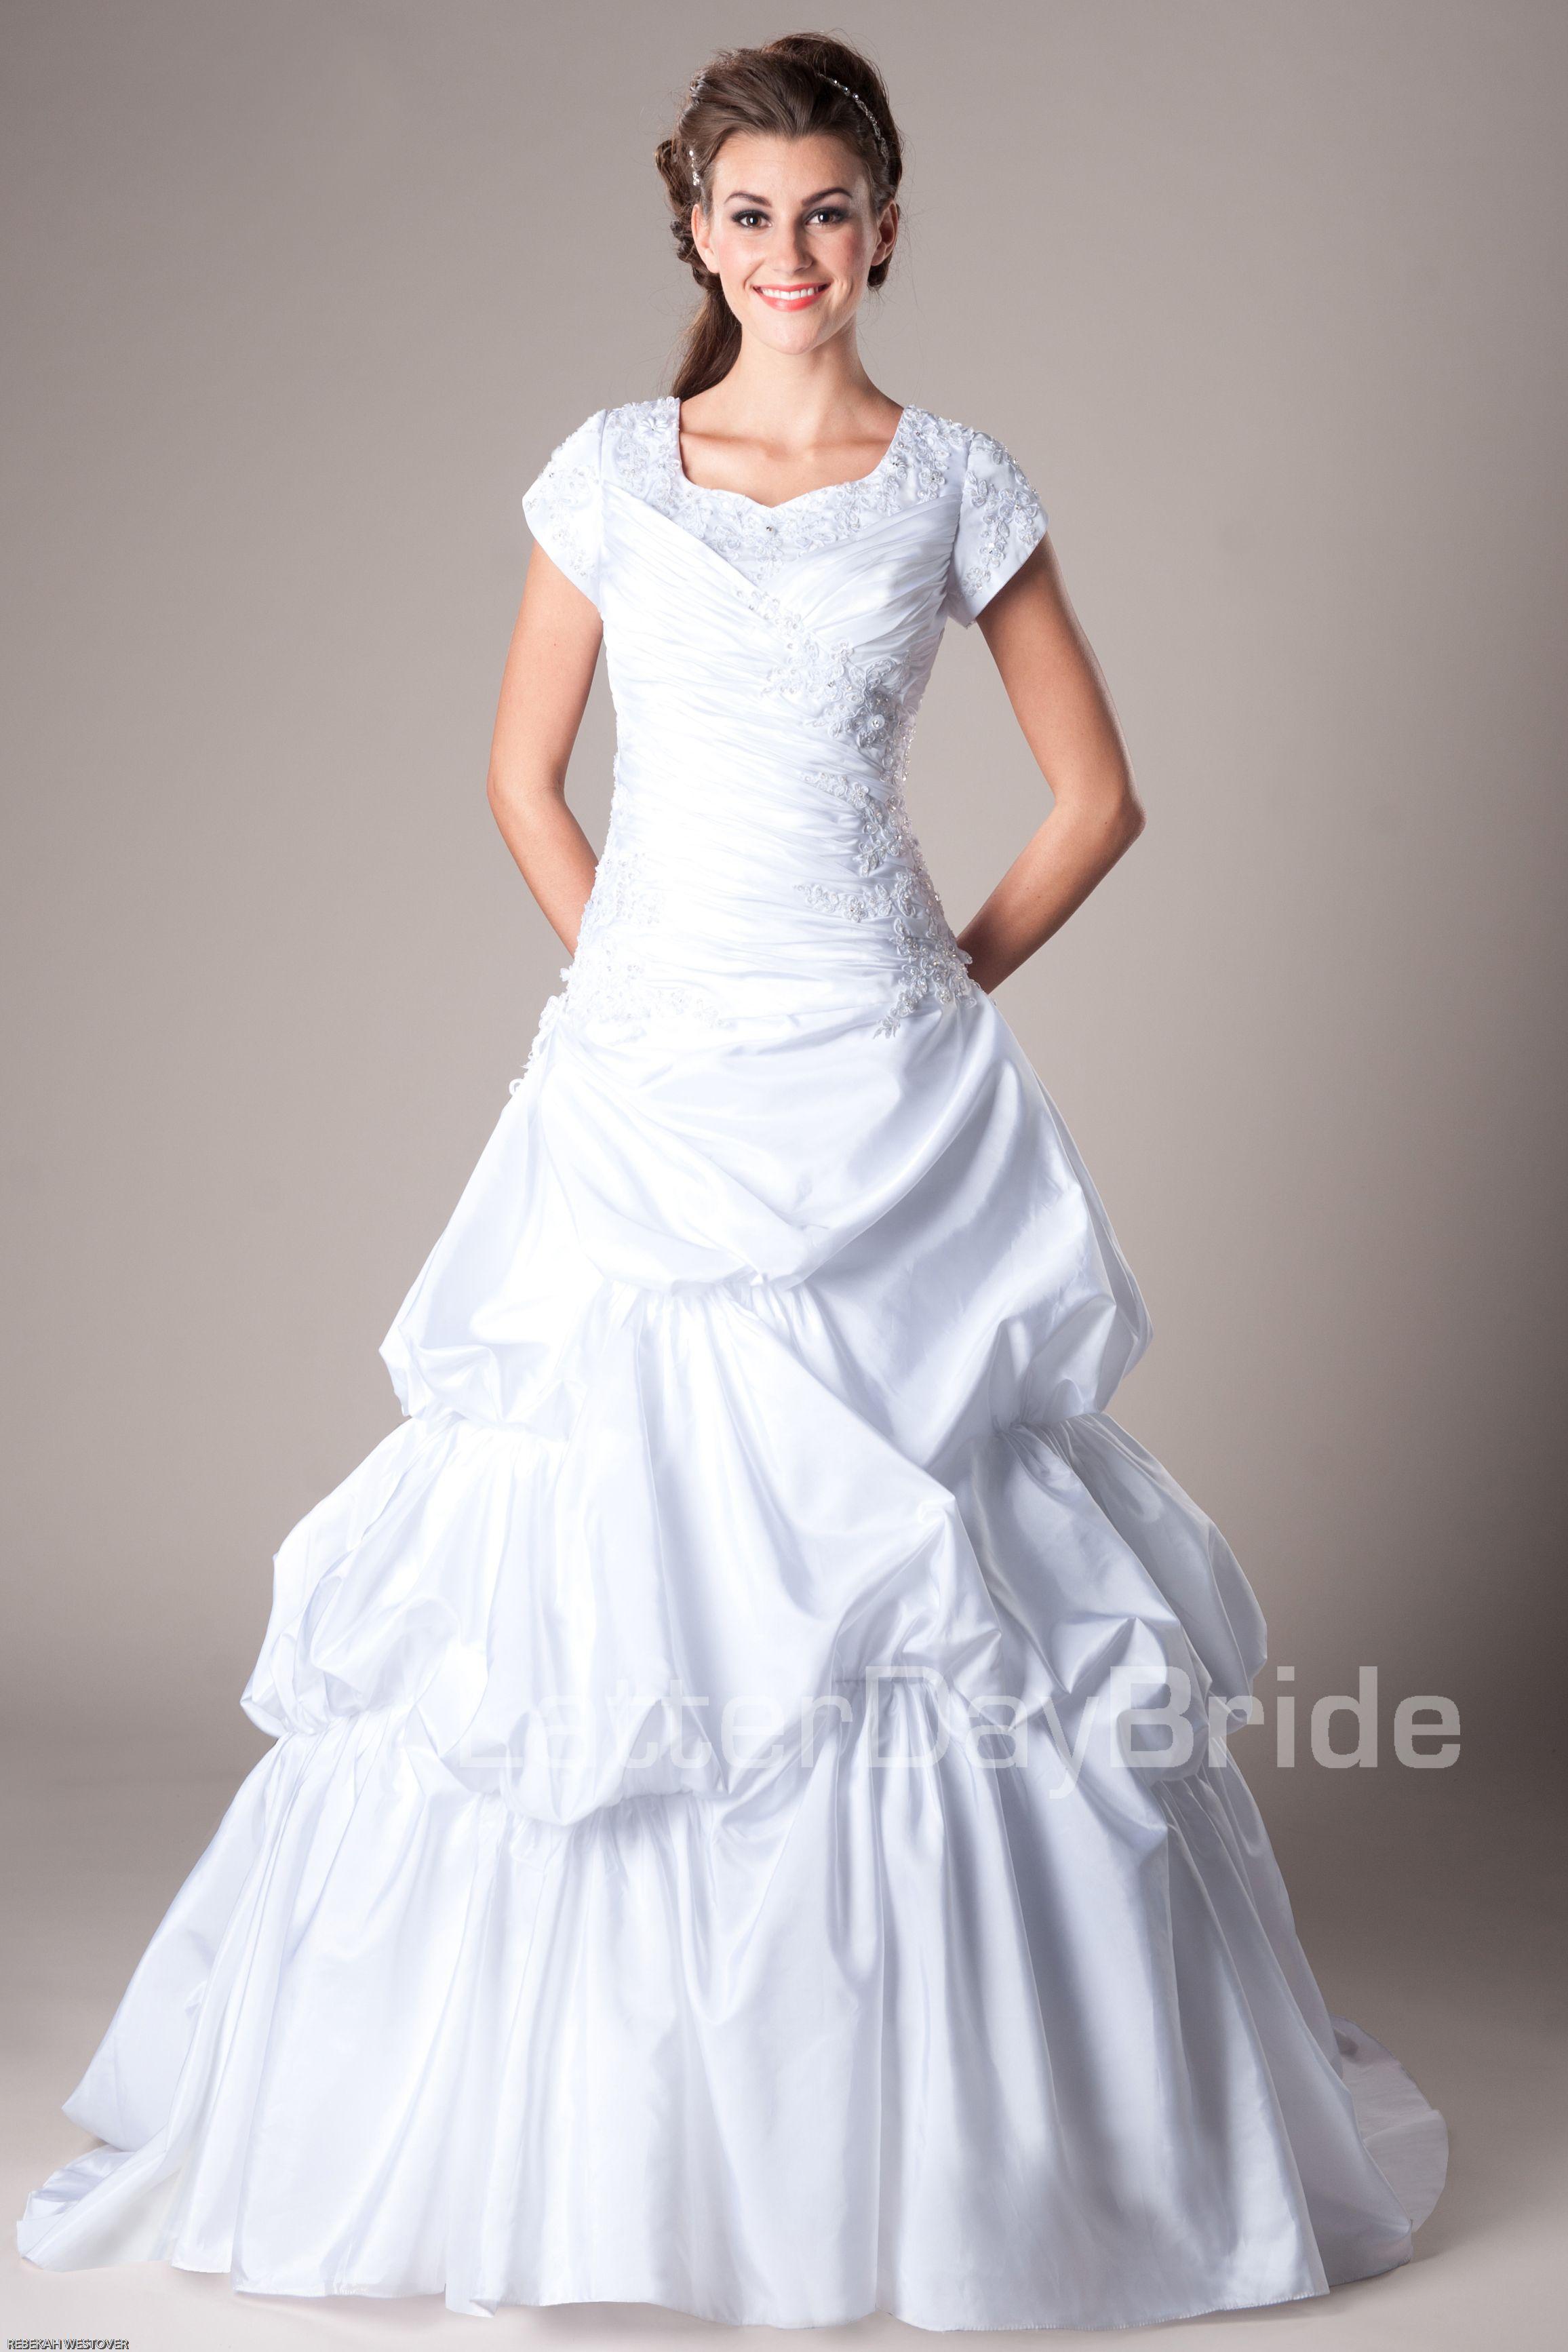 0a2fe1064215 Modest Bridesmaid Dresses Lds